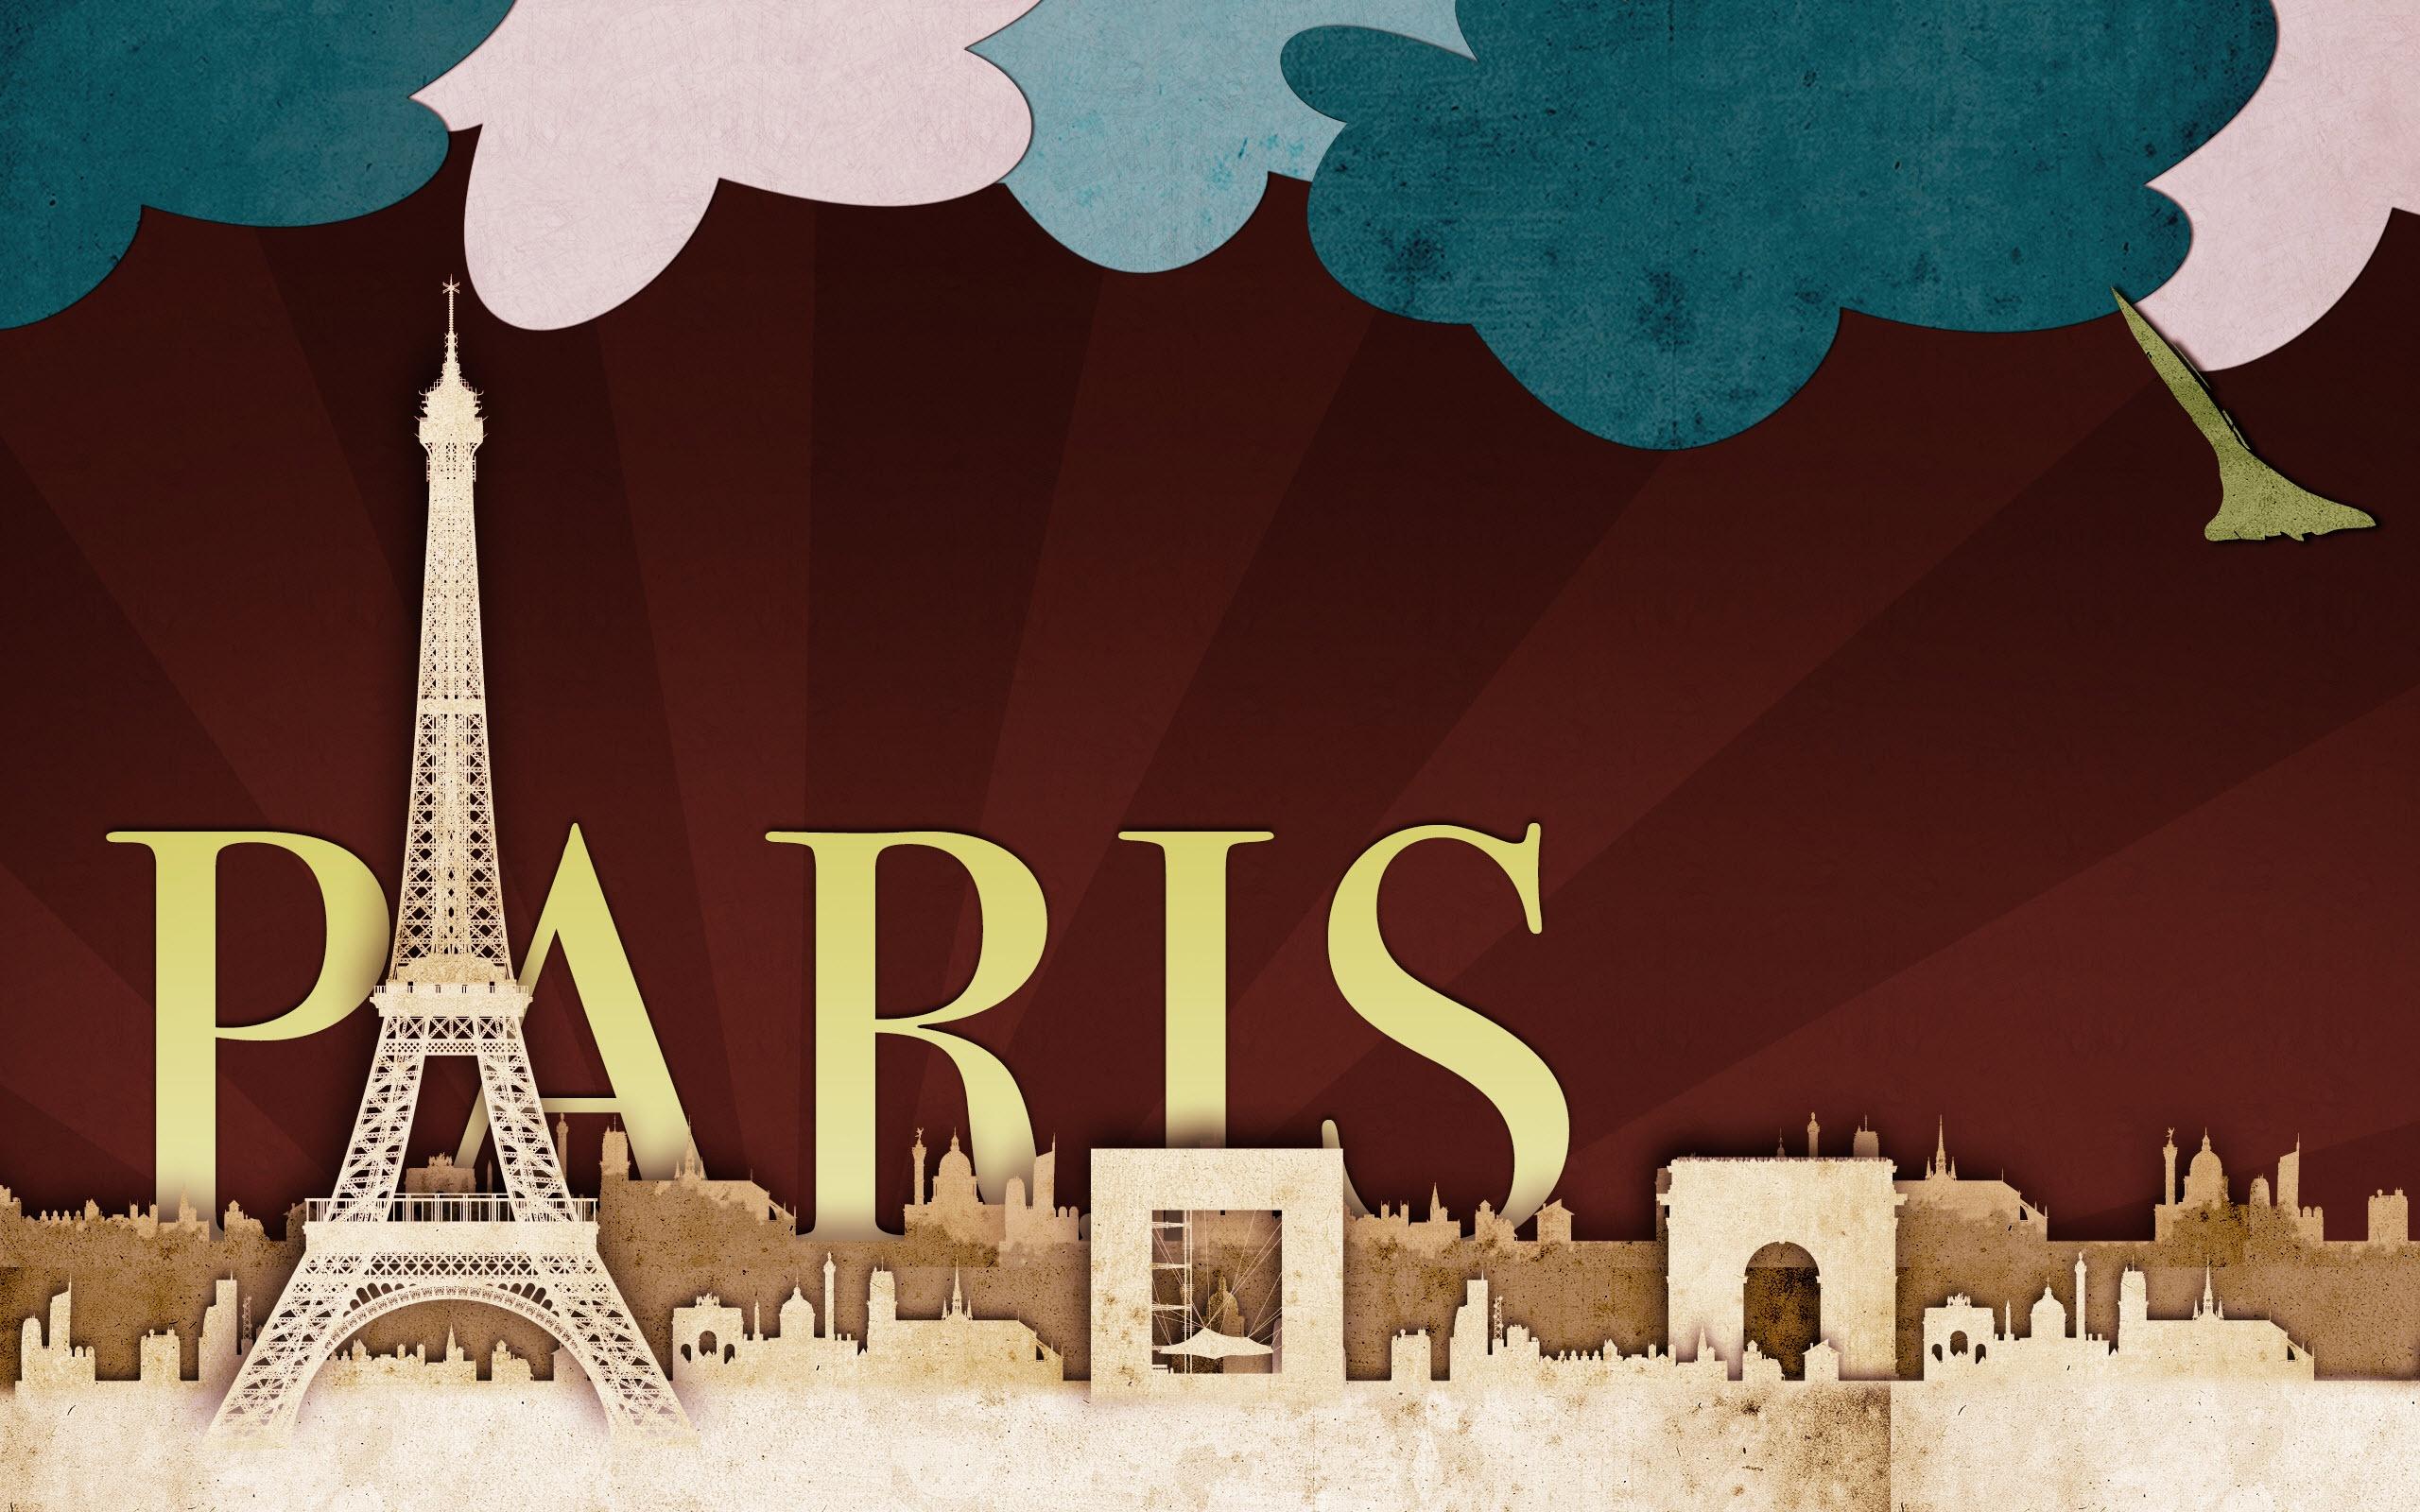 Wallpaper download paris - Paris Scrap Art